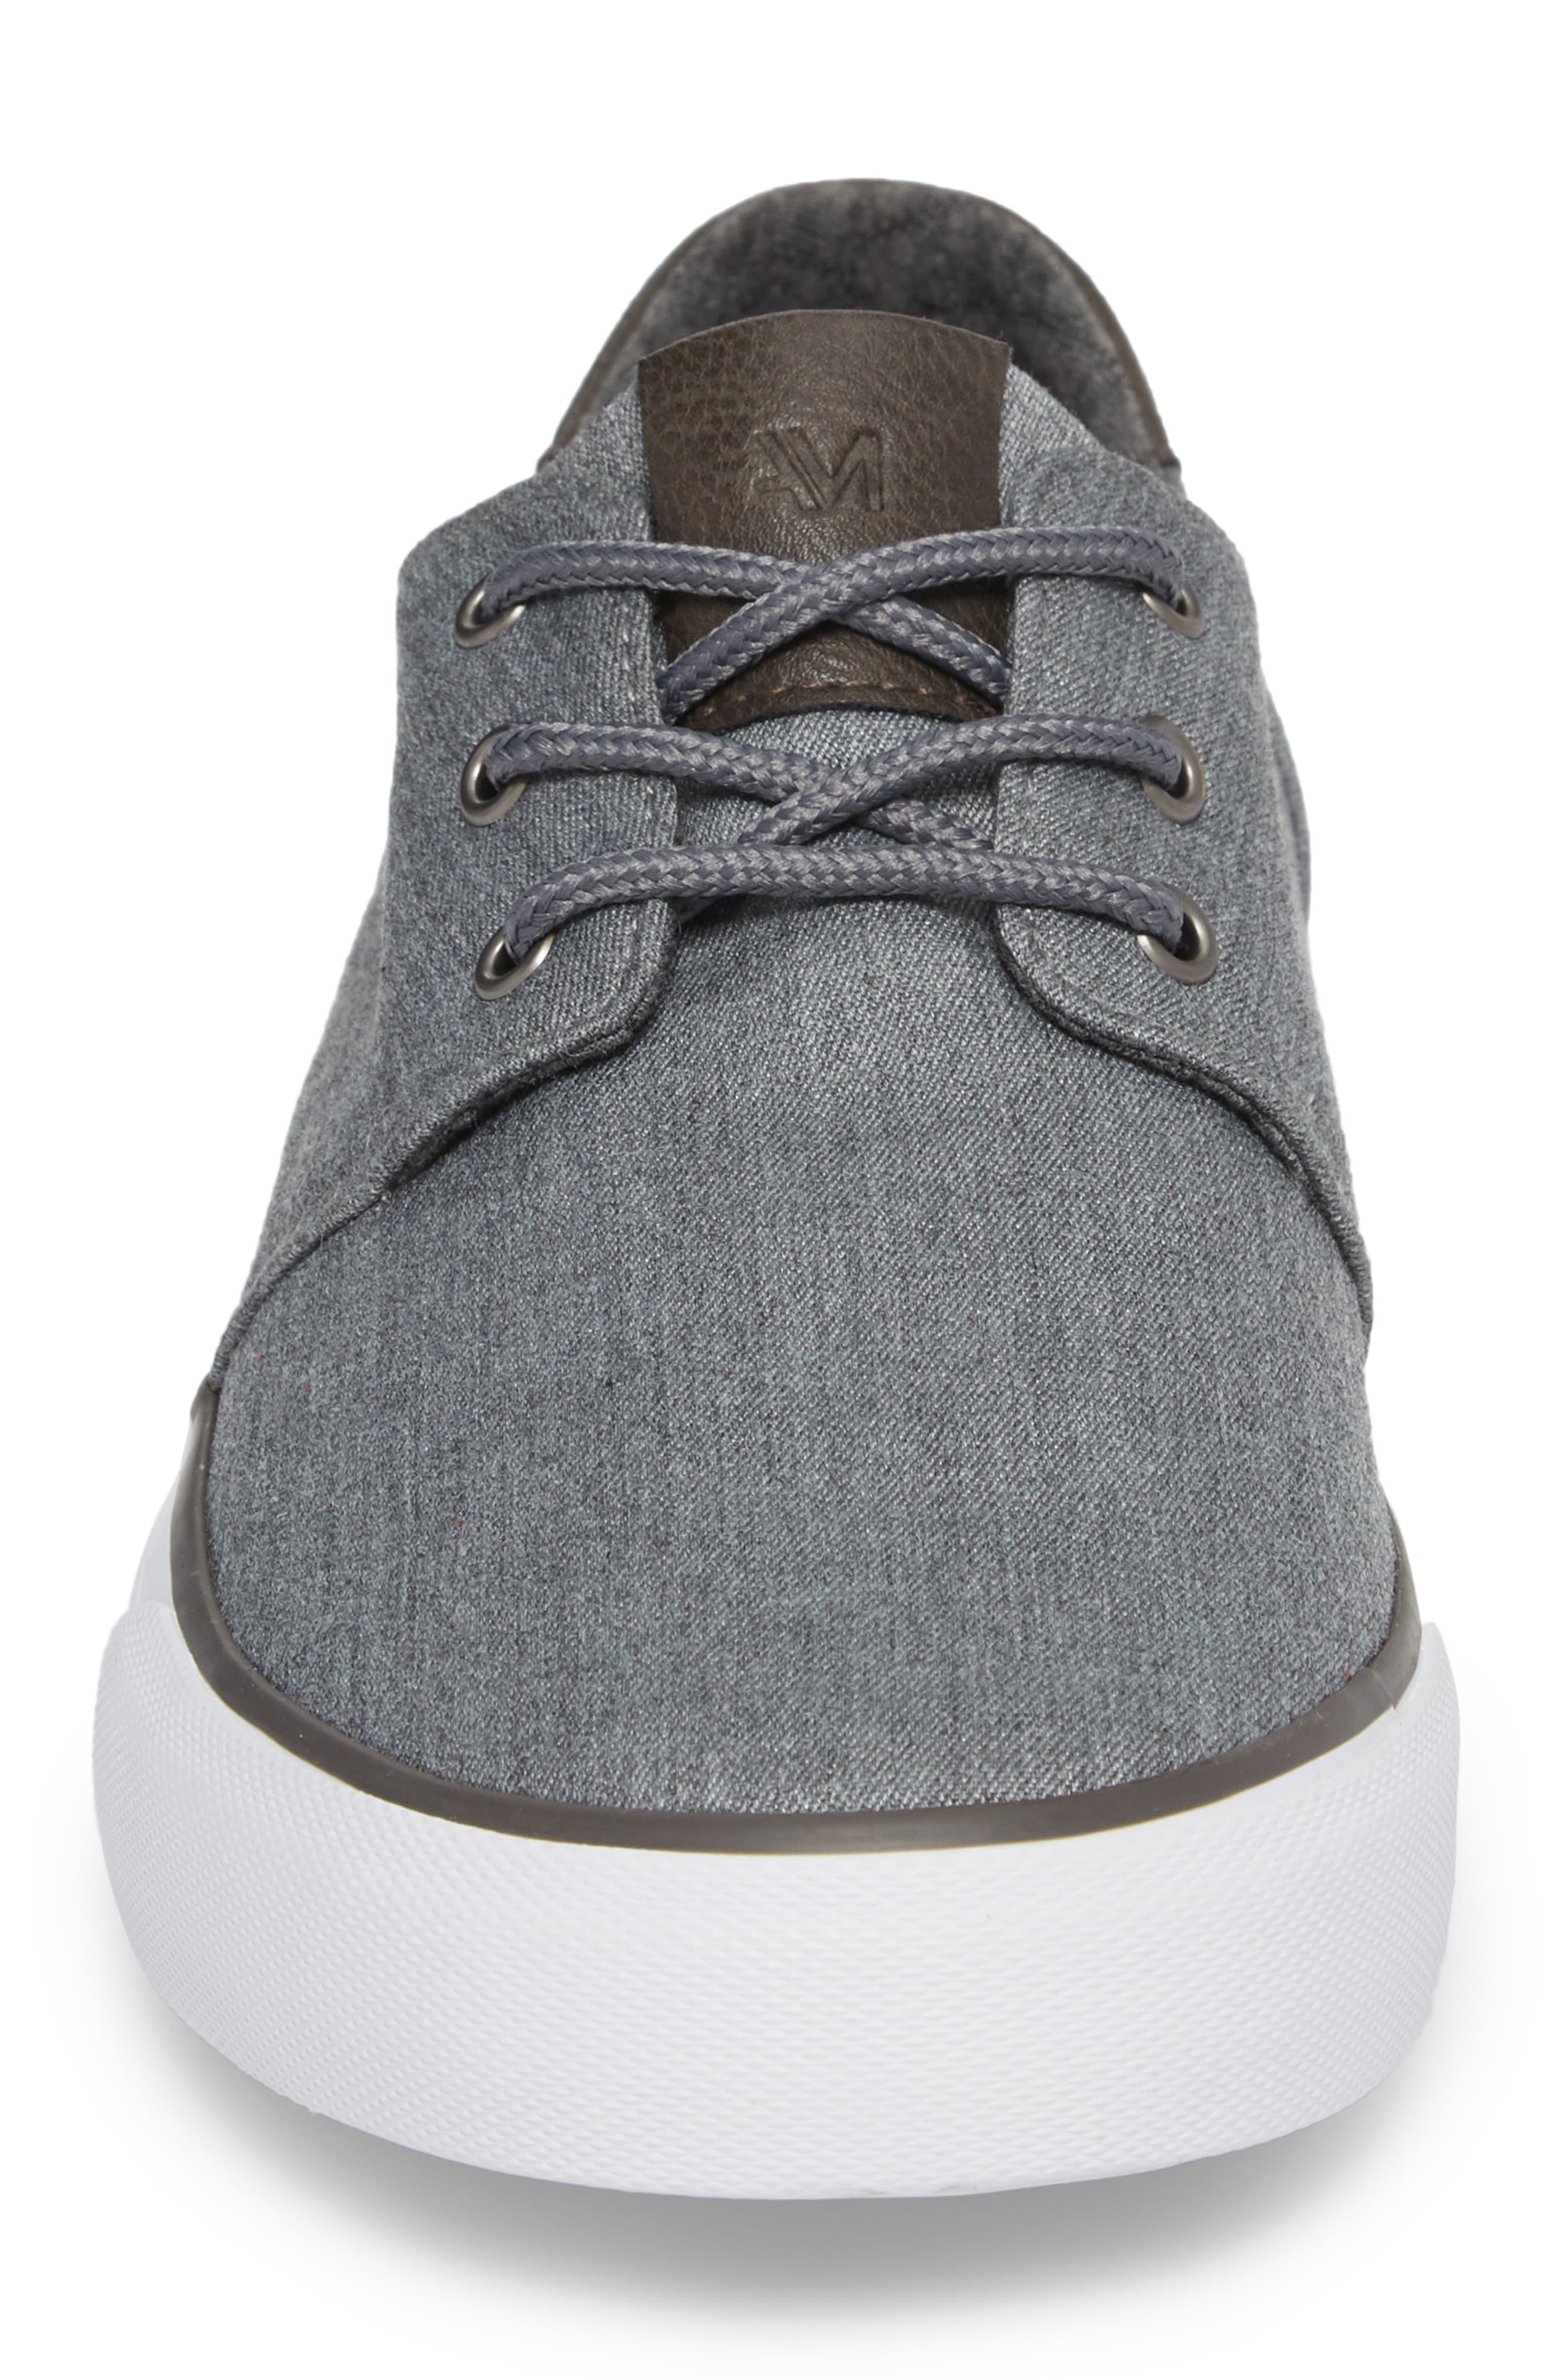 Briggs Low Top Sneaker,                             Alternate thumbnail 4, color,                             CHARCOAL/ DARK GREY/ WHITE